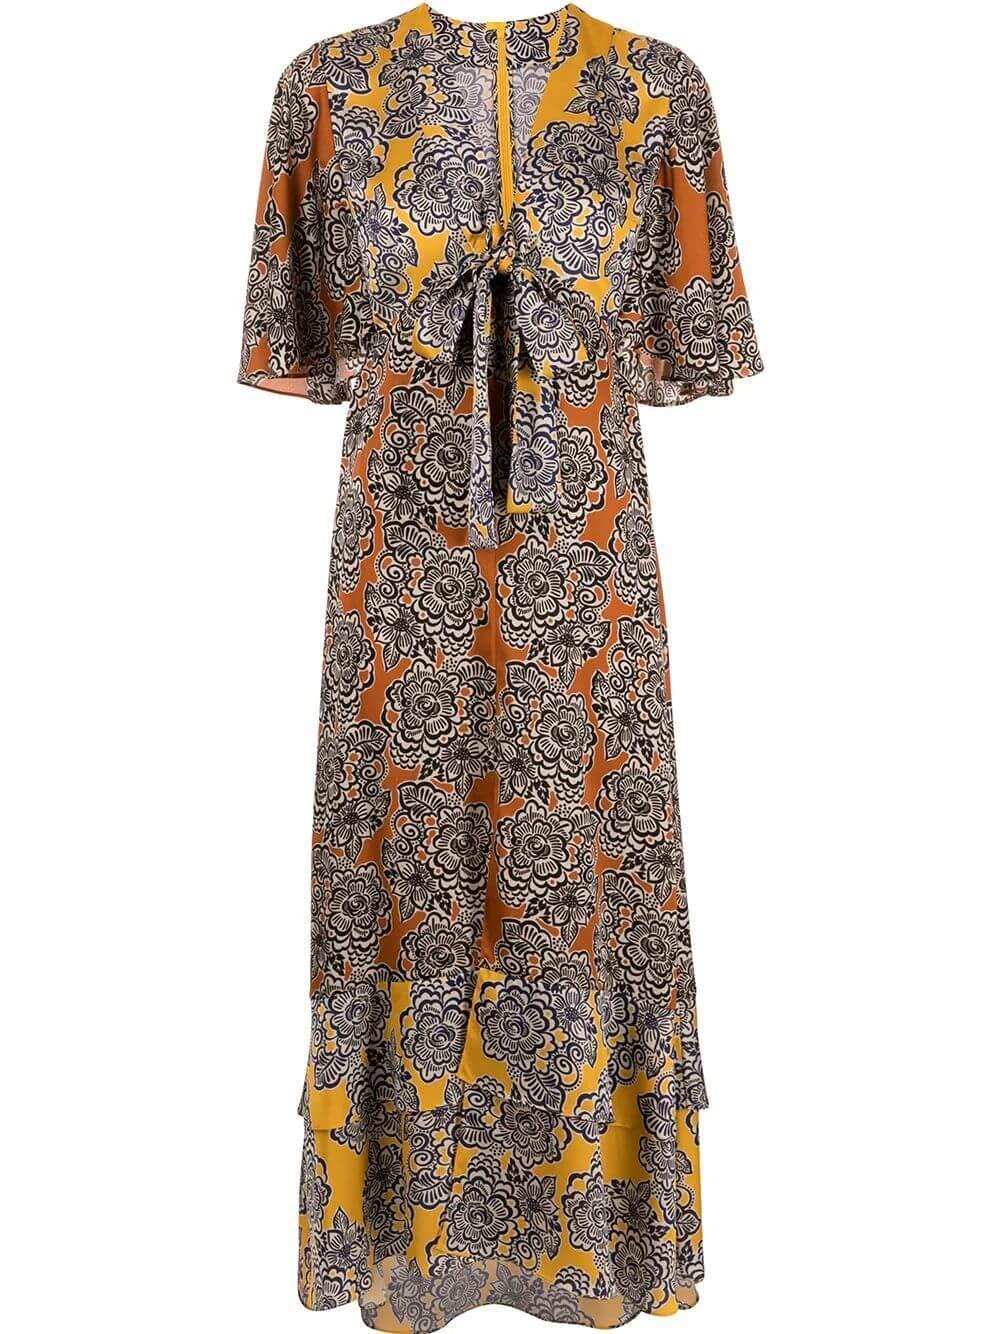 Rajana Printed Dress Item # A1210410-6988